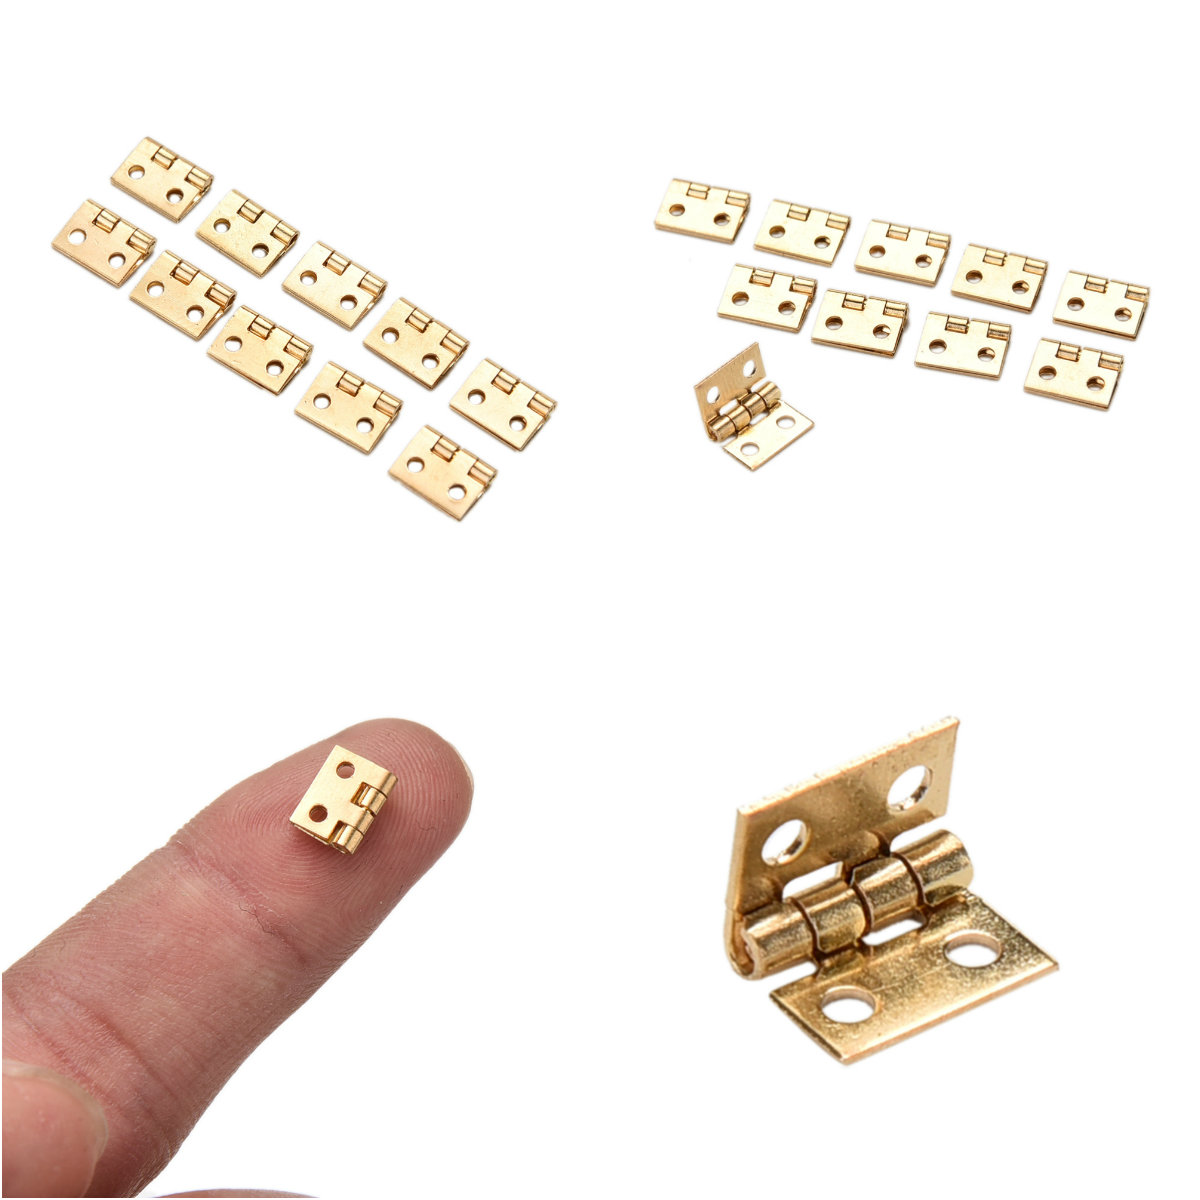 10 Pcs/lot 10*8MM Mini Cabinet Drawer Hinge Butt Hinge Copper Gold 4 Small Small Hinge Hole Hand Tools Hardware